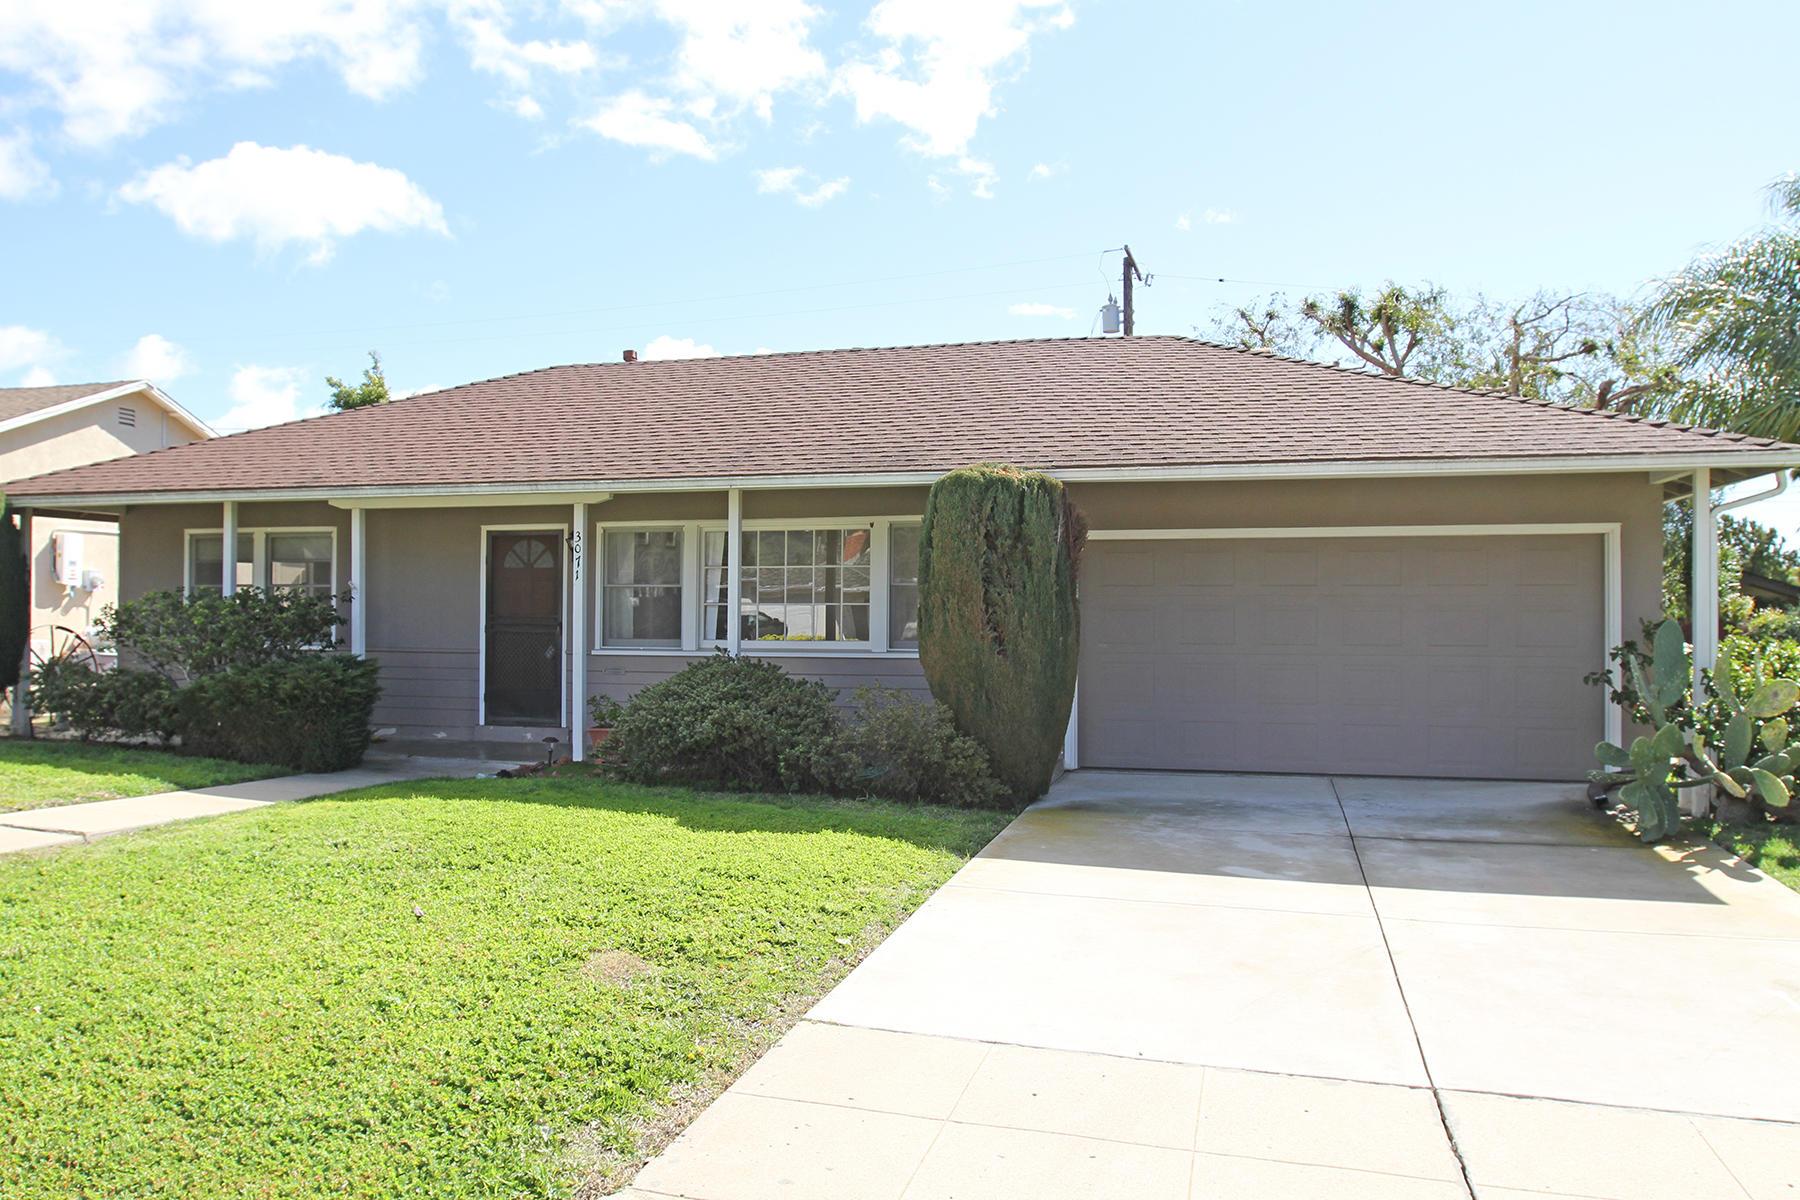 Property photo for 3071 Paseo Tranquillo Santa Barbara, California 93105 - 19-466